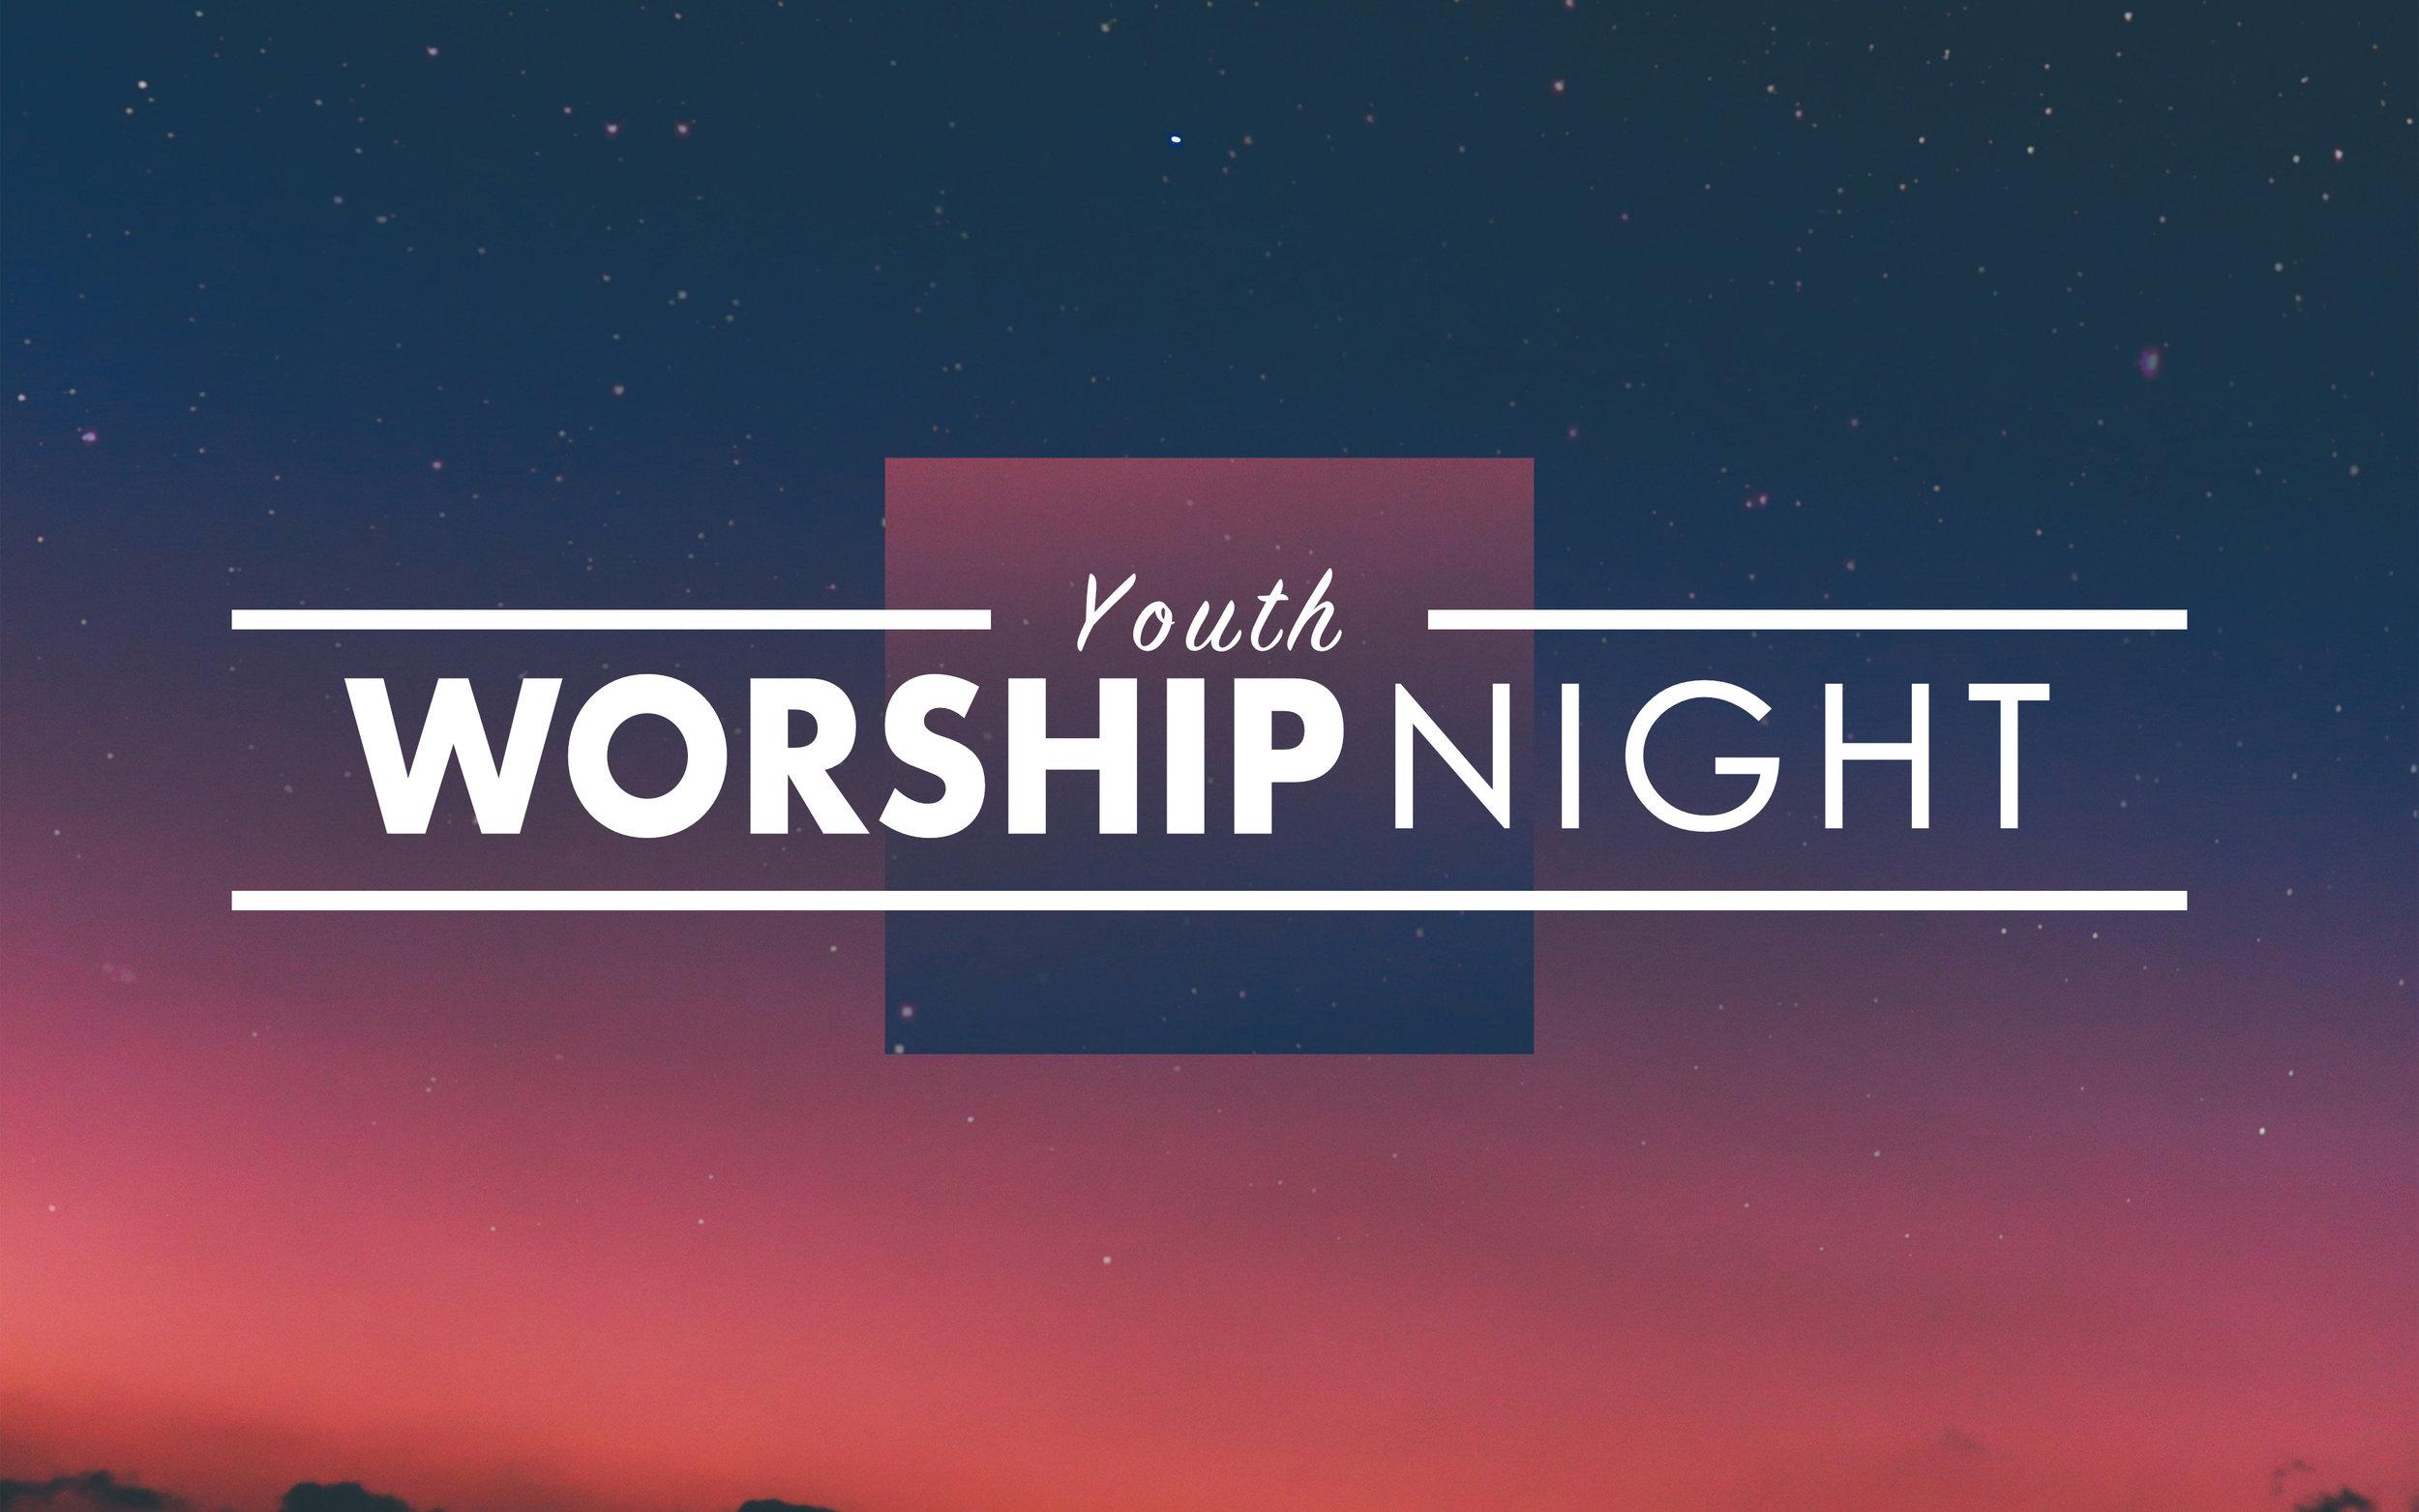 Youth-Worship-Night.jpg